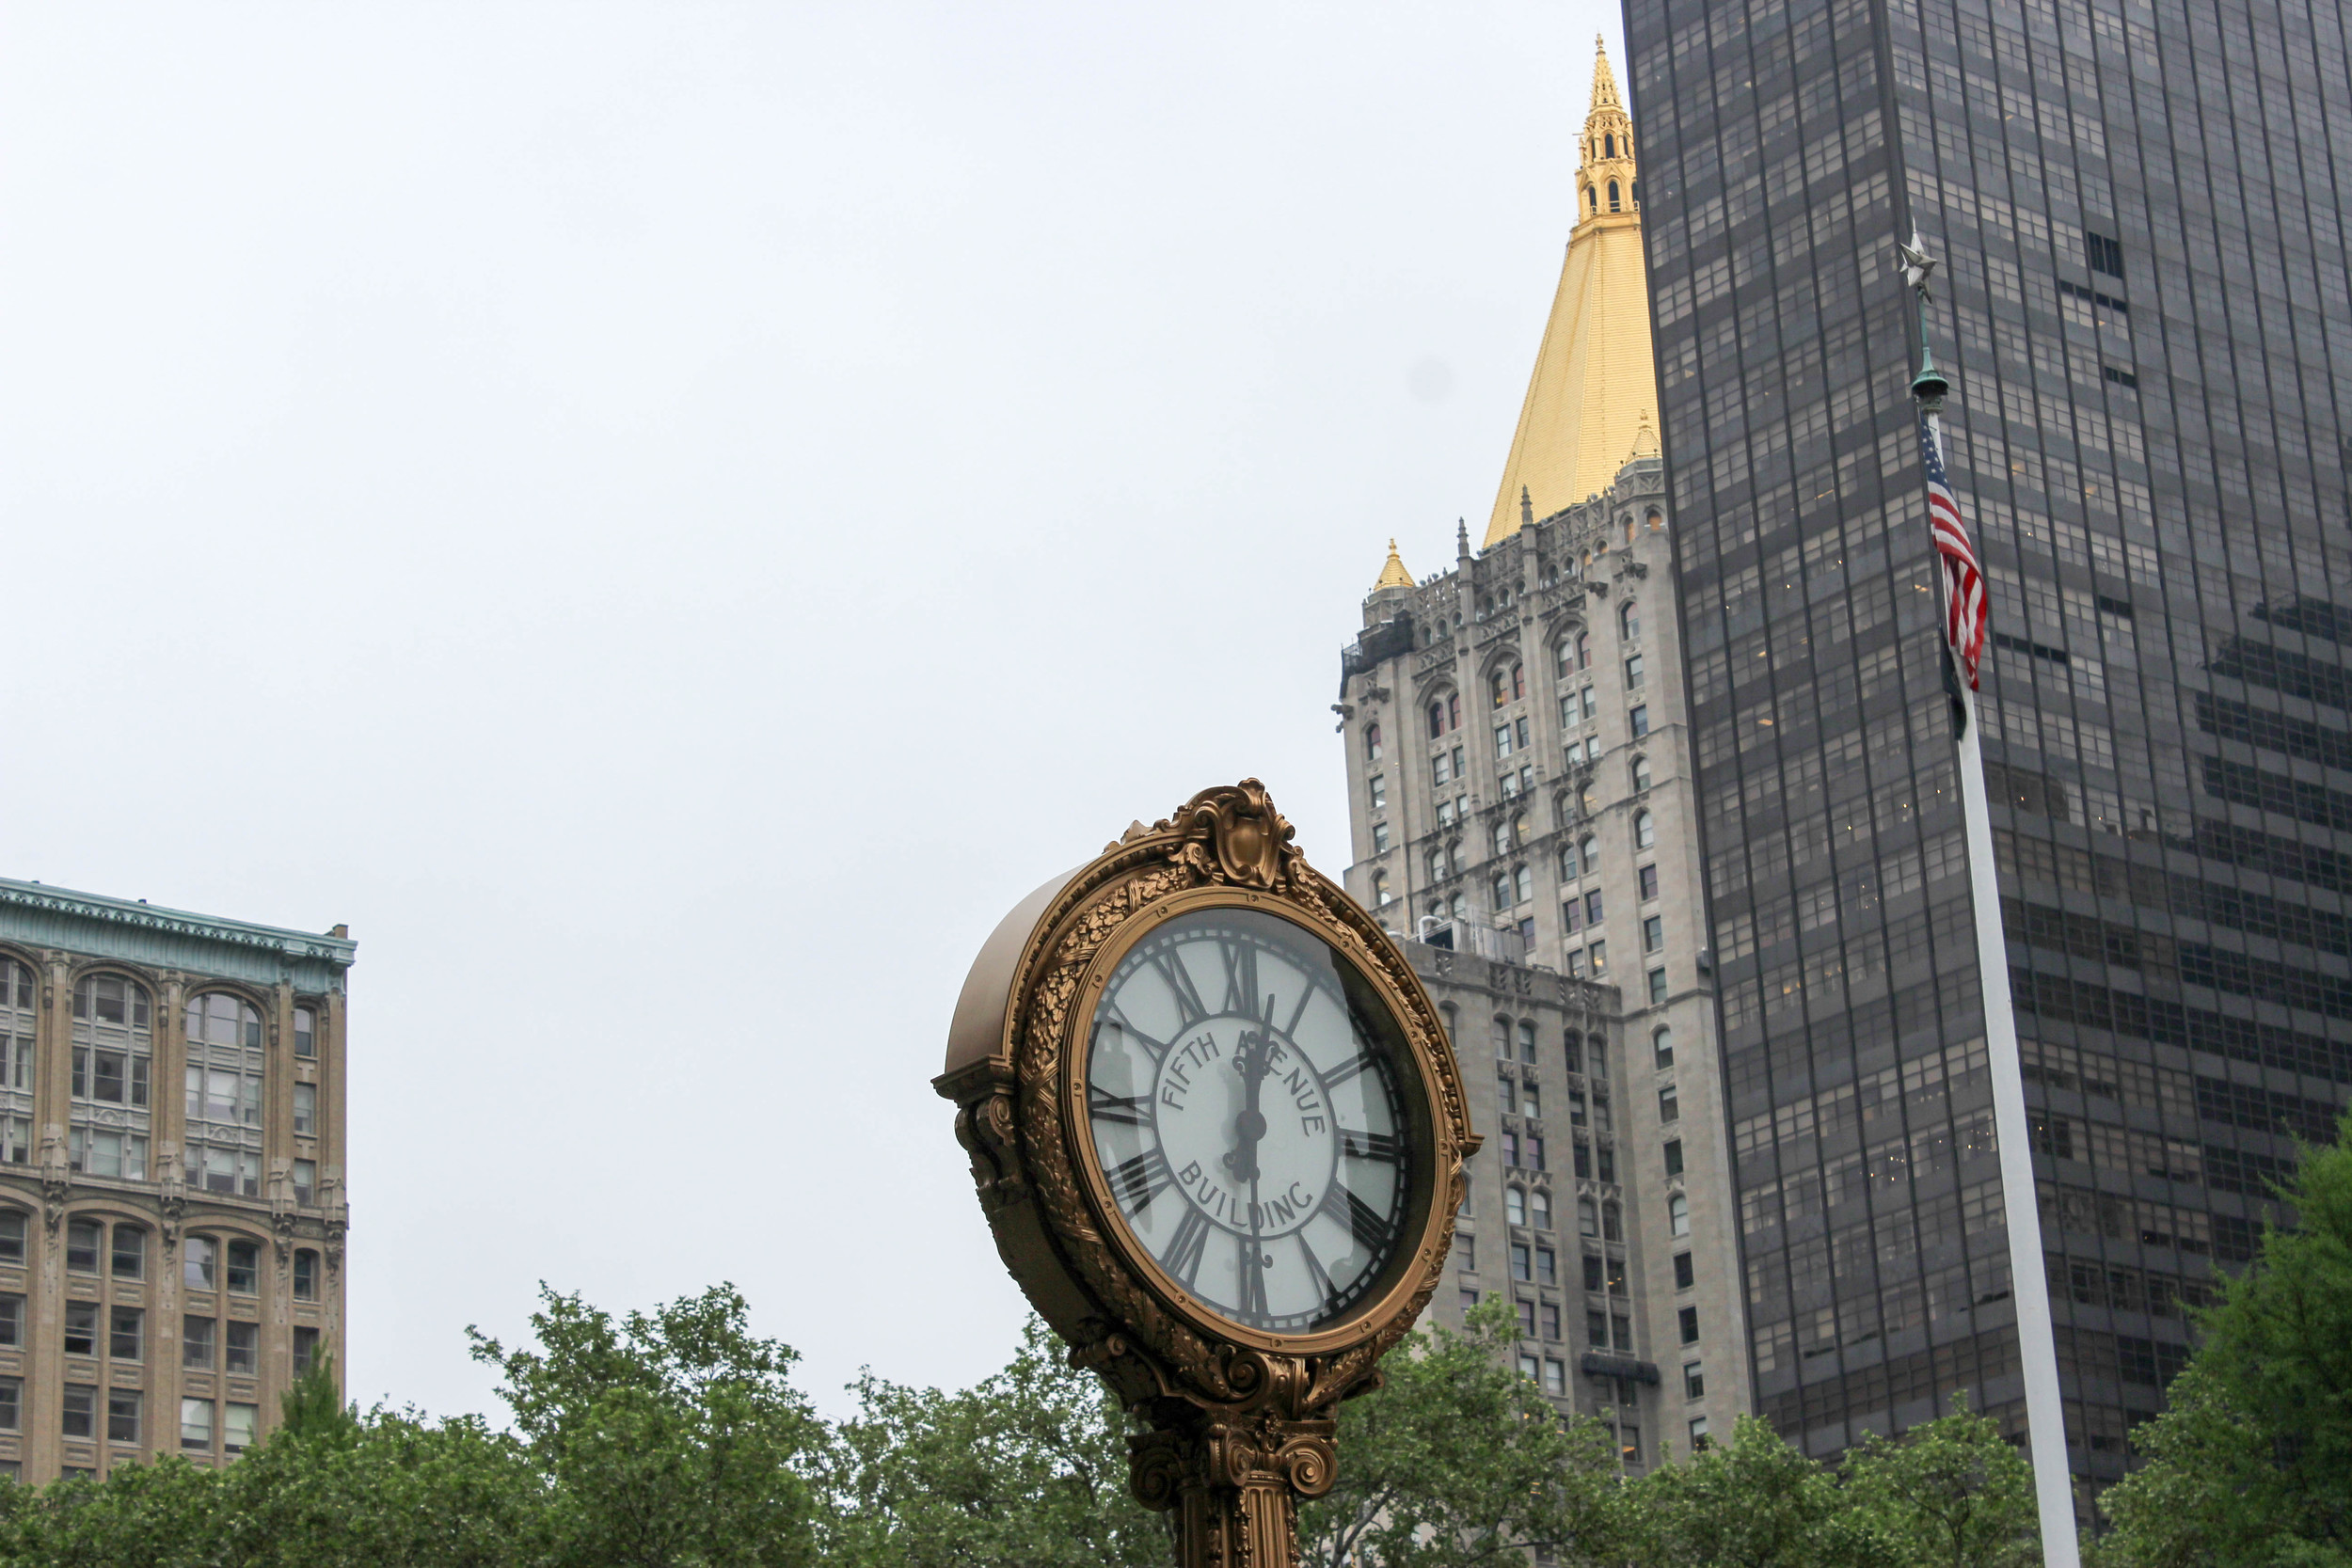 Manhattan, New York City, Midtown, Architecture, Street View, Fifth Avenue